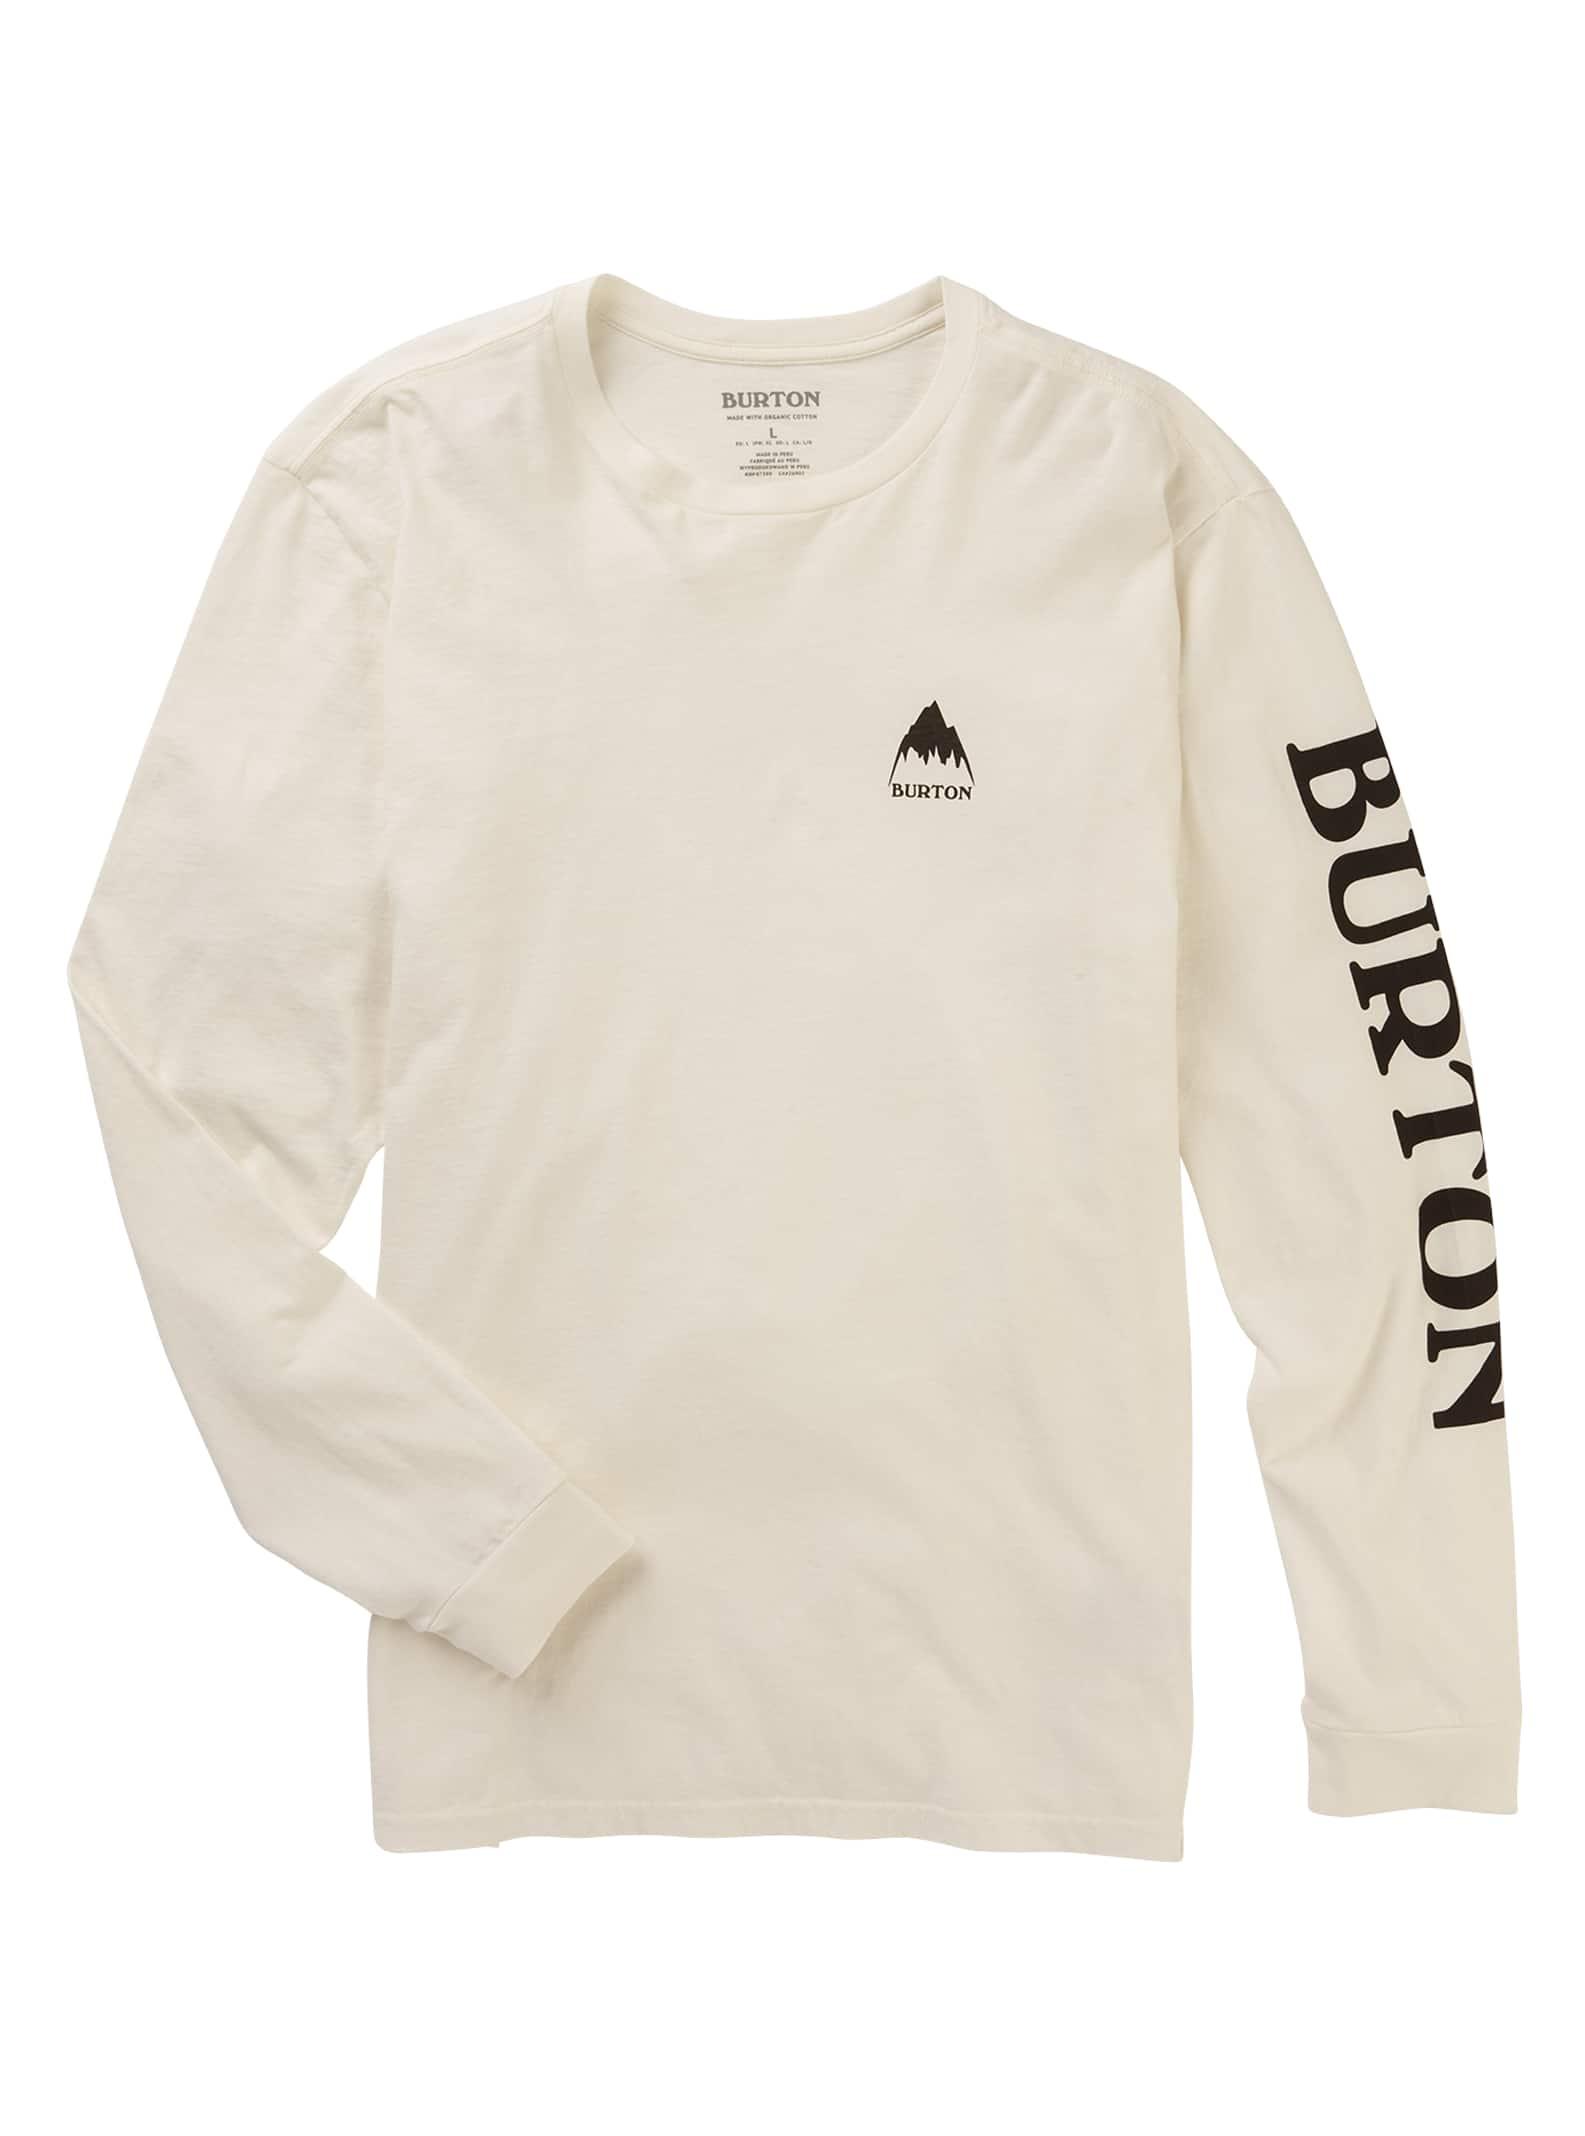 6b6a8fb4 Men's T-Shirts | Burton Snowboards